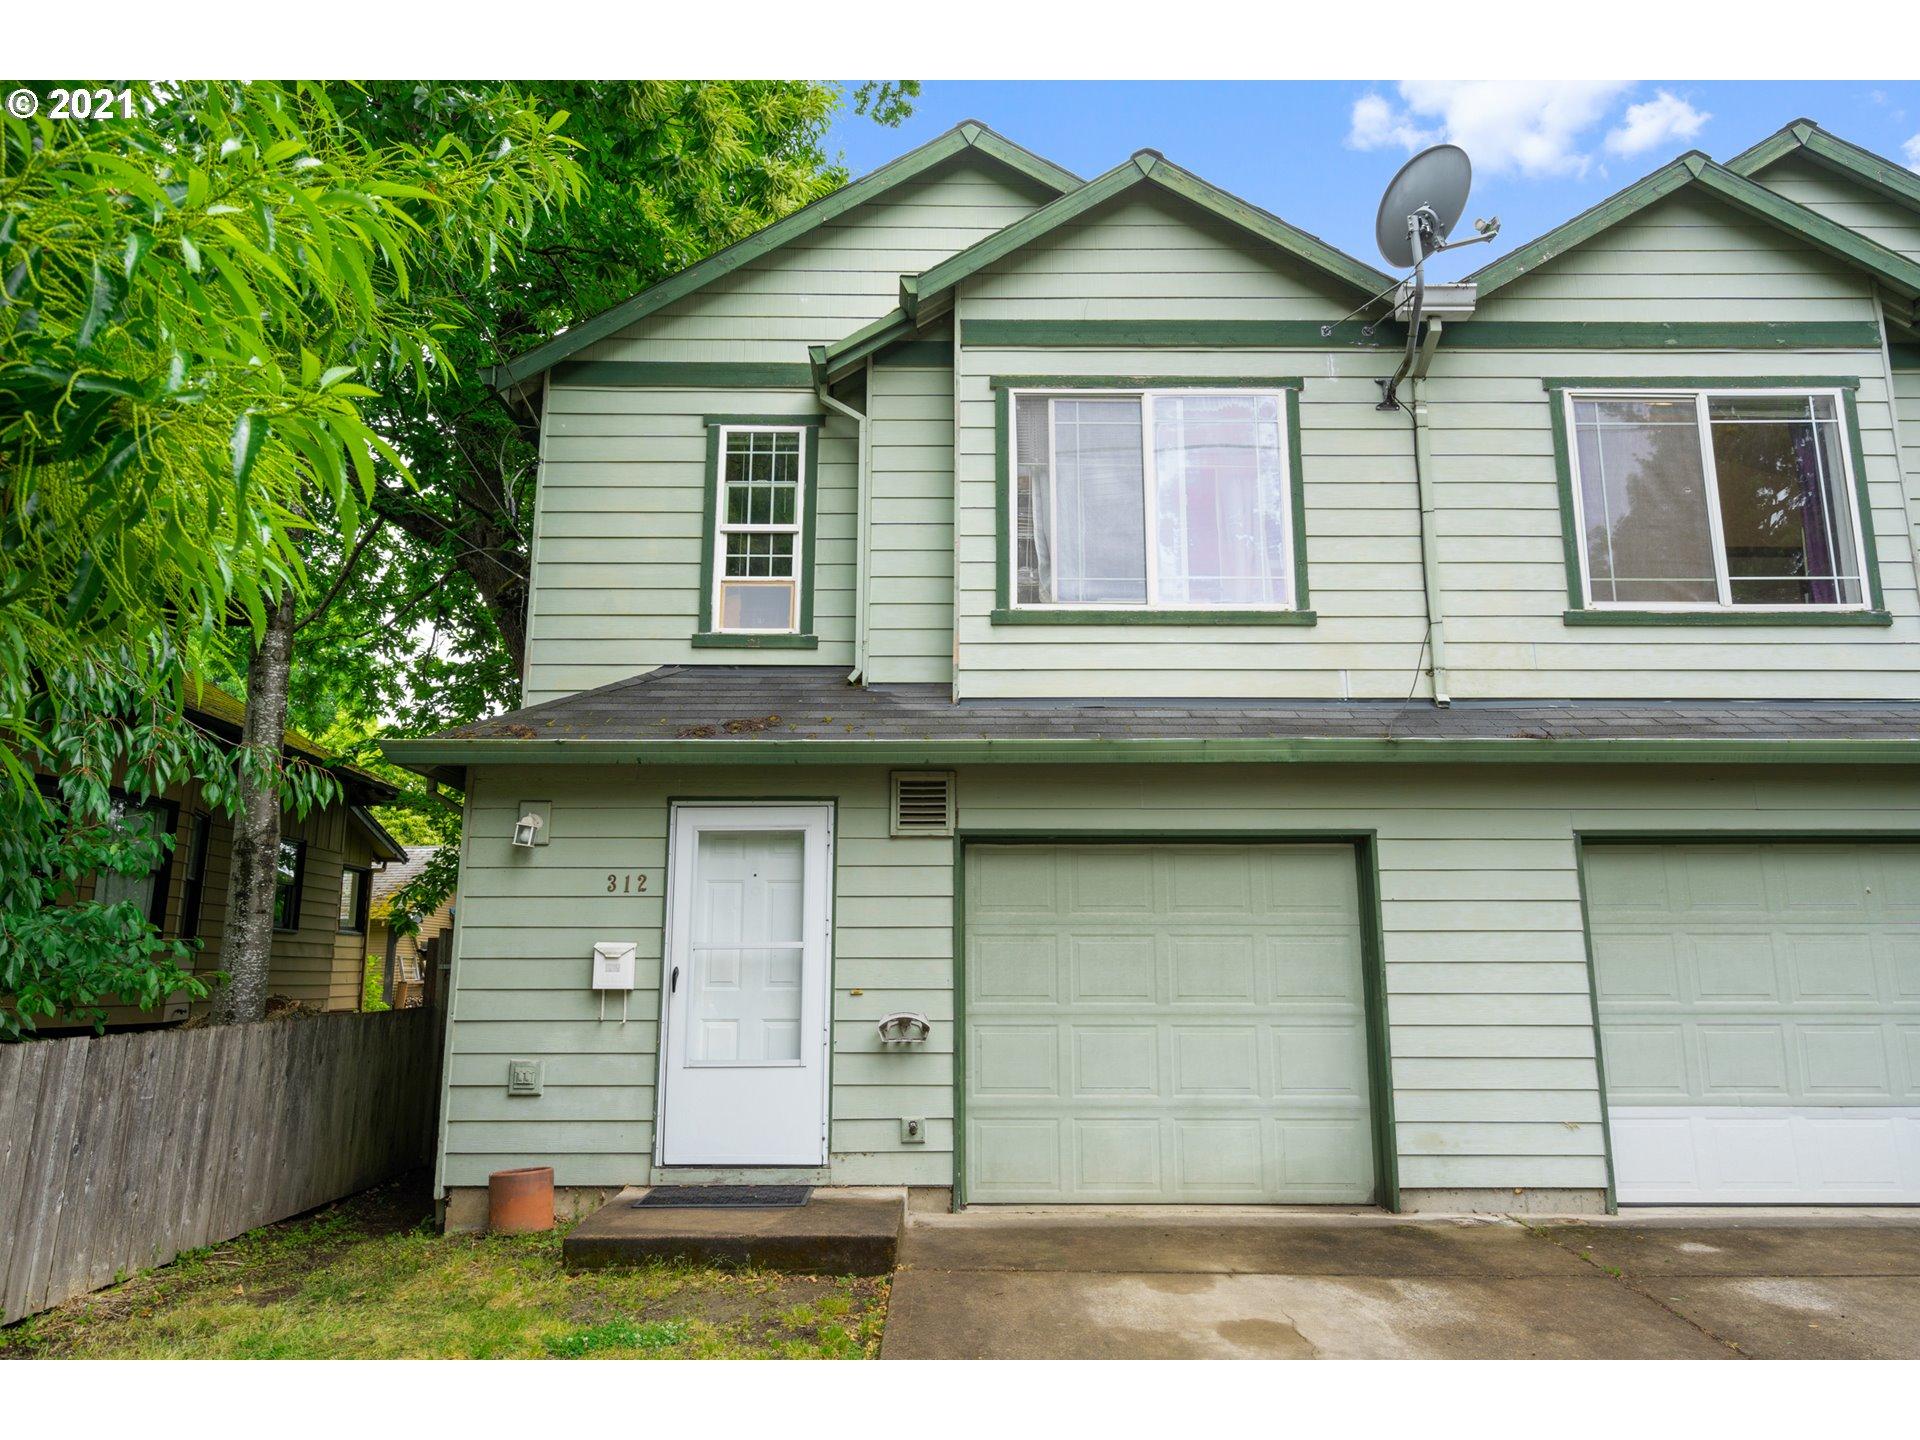 312 SE 88TH AVE, Portland OR 97216